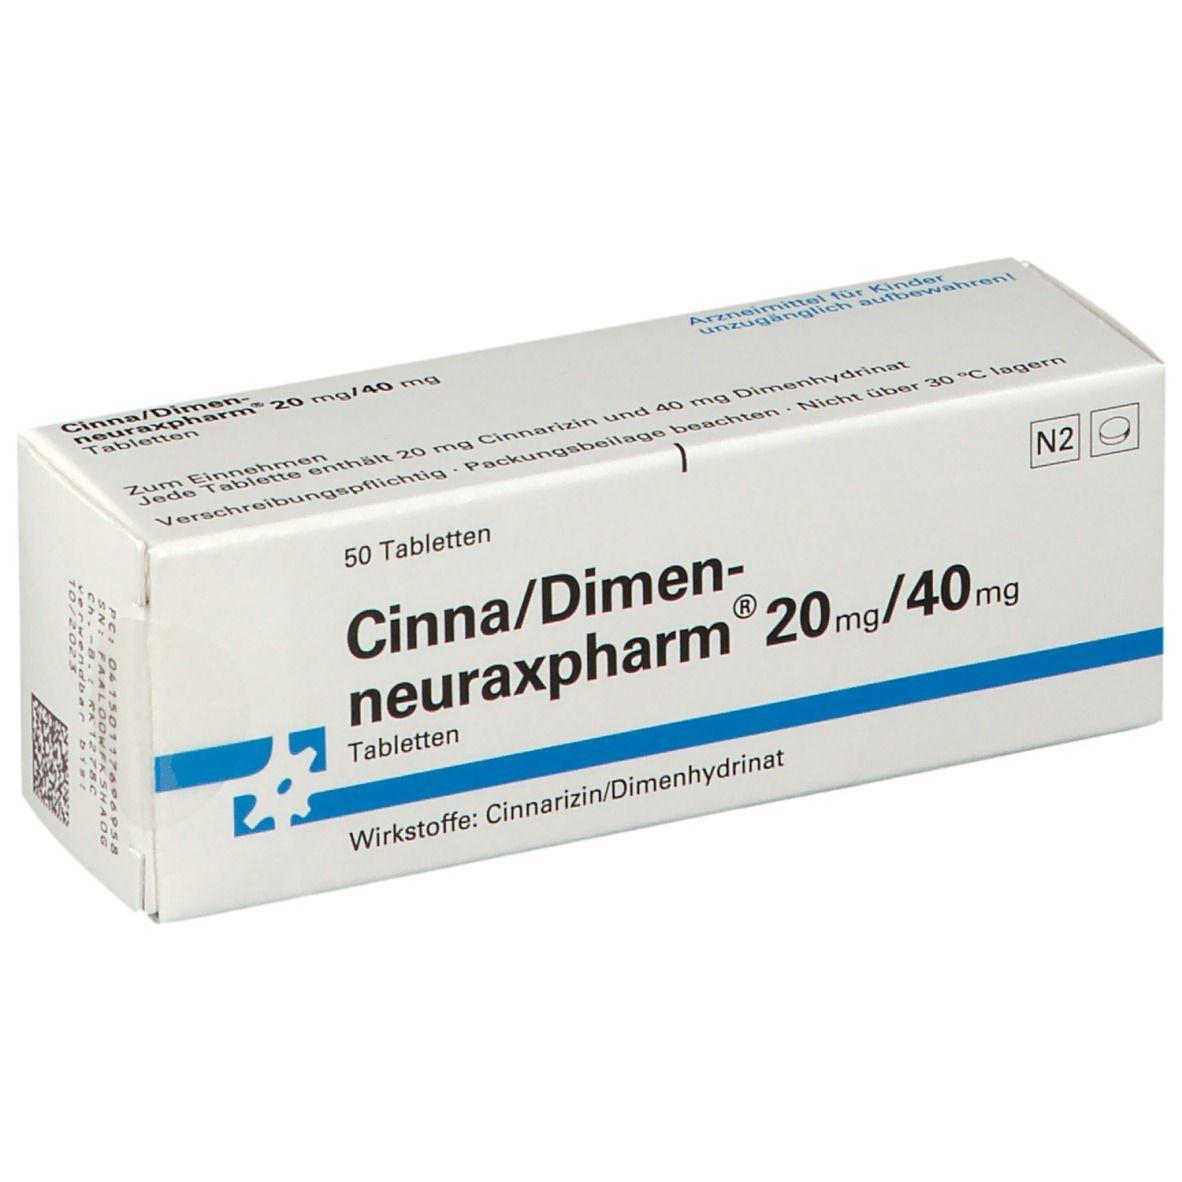 CINNA/DIMEN-neuraxpharm 20 mg/40 mg Tabletten